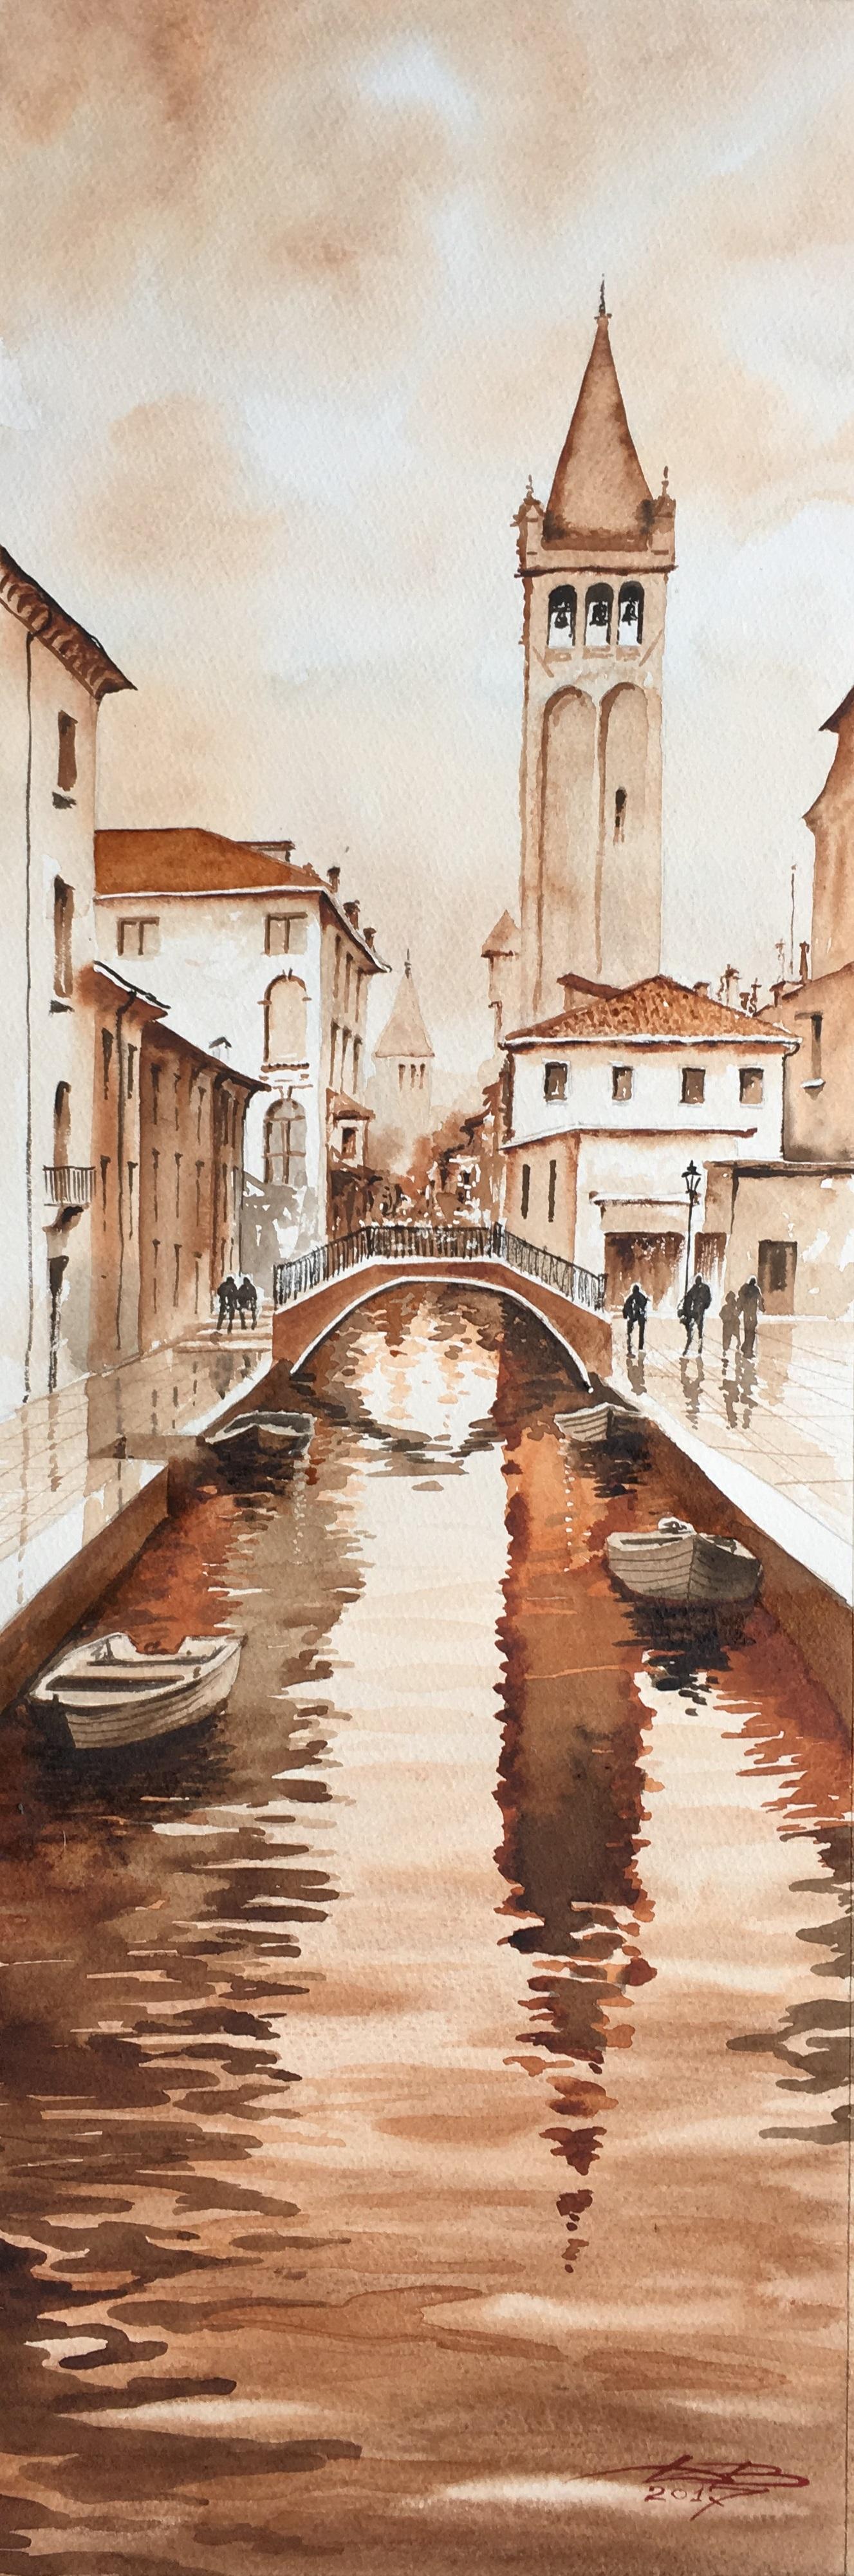 Monochrome Venice